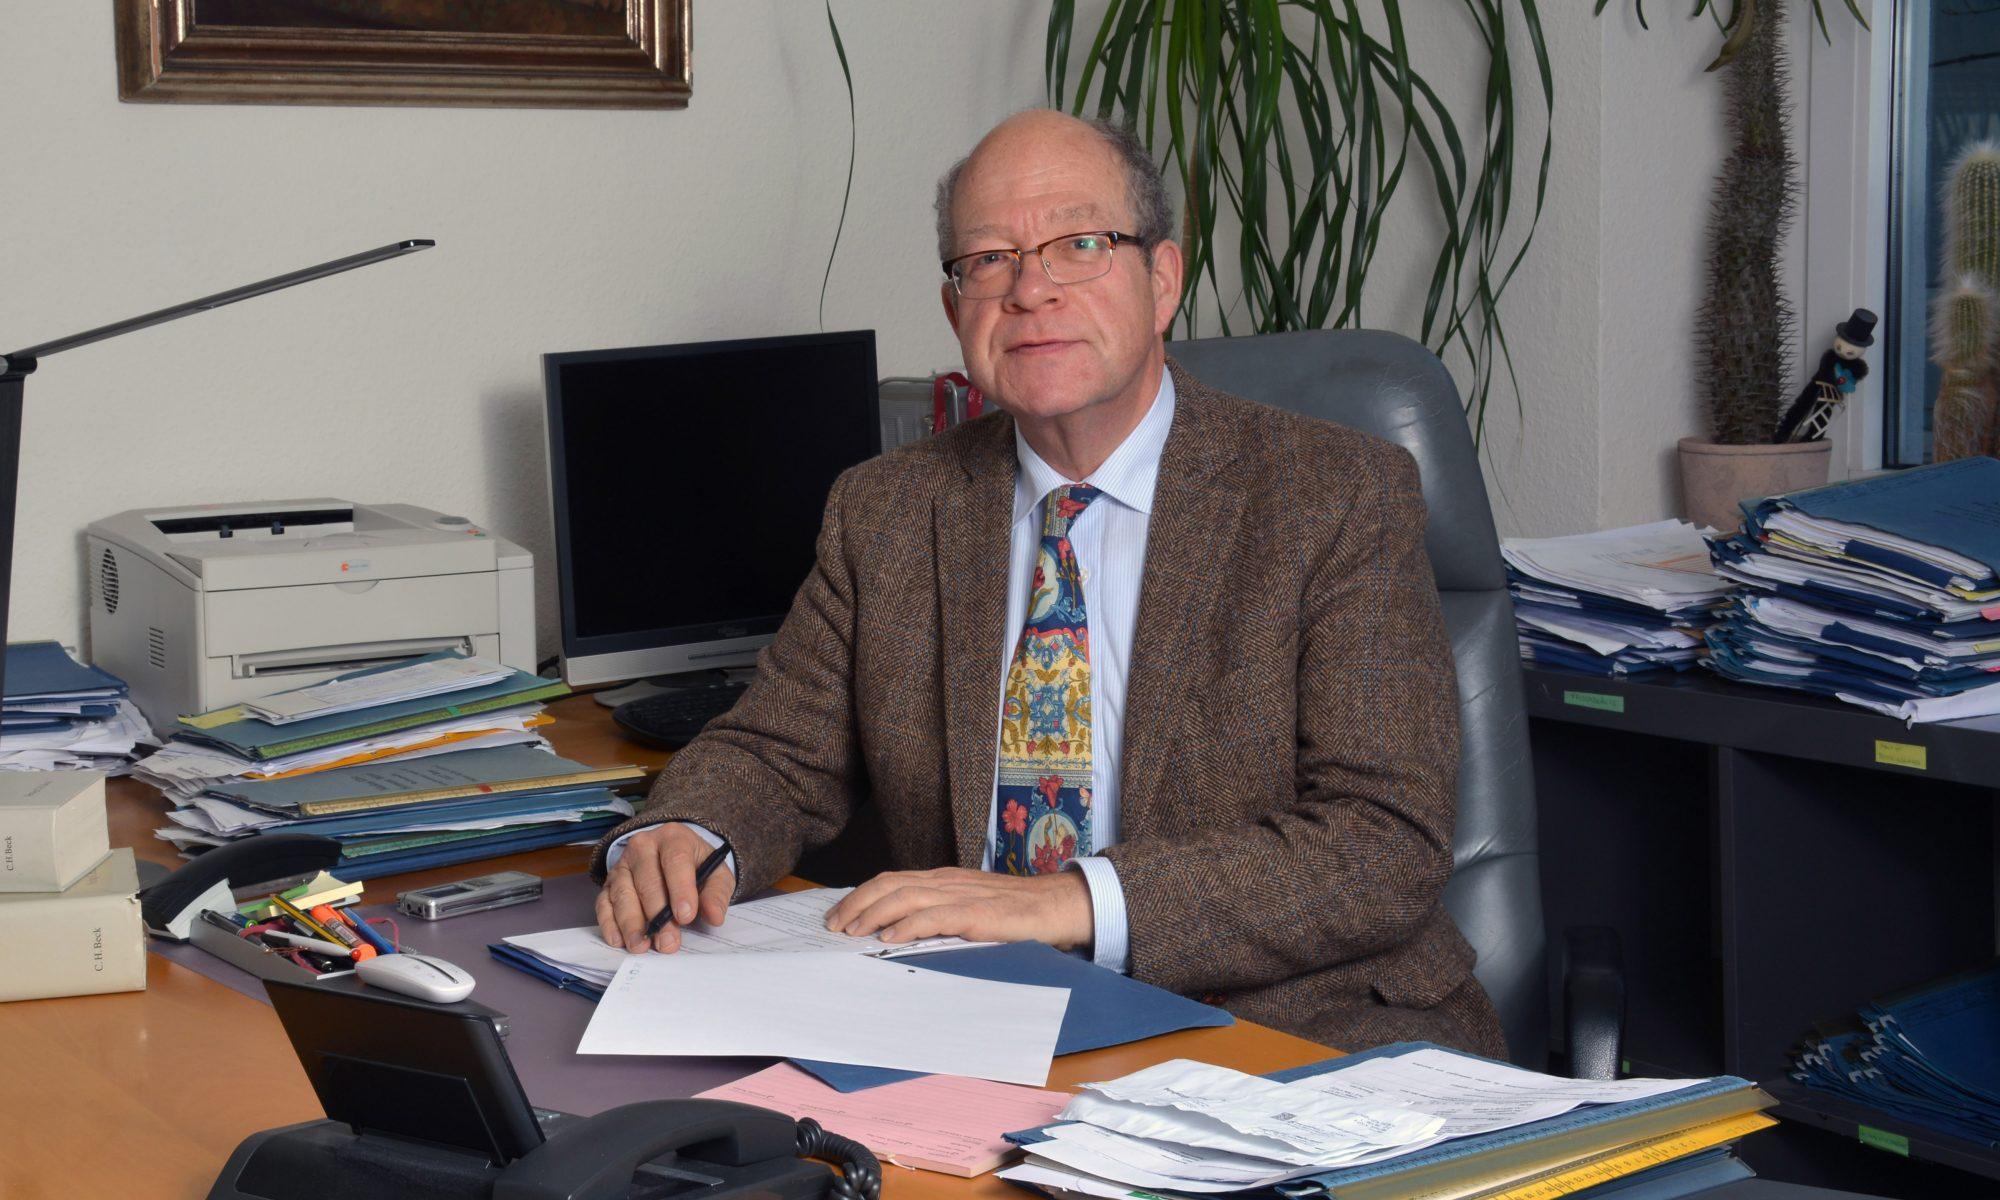 Rechtsanwalt Markus Klotz